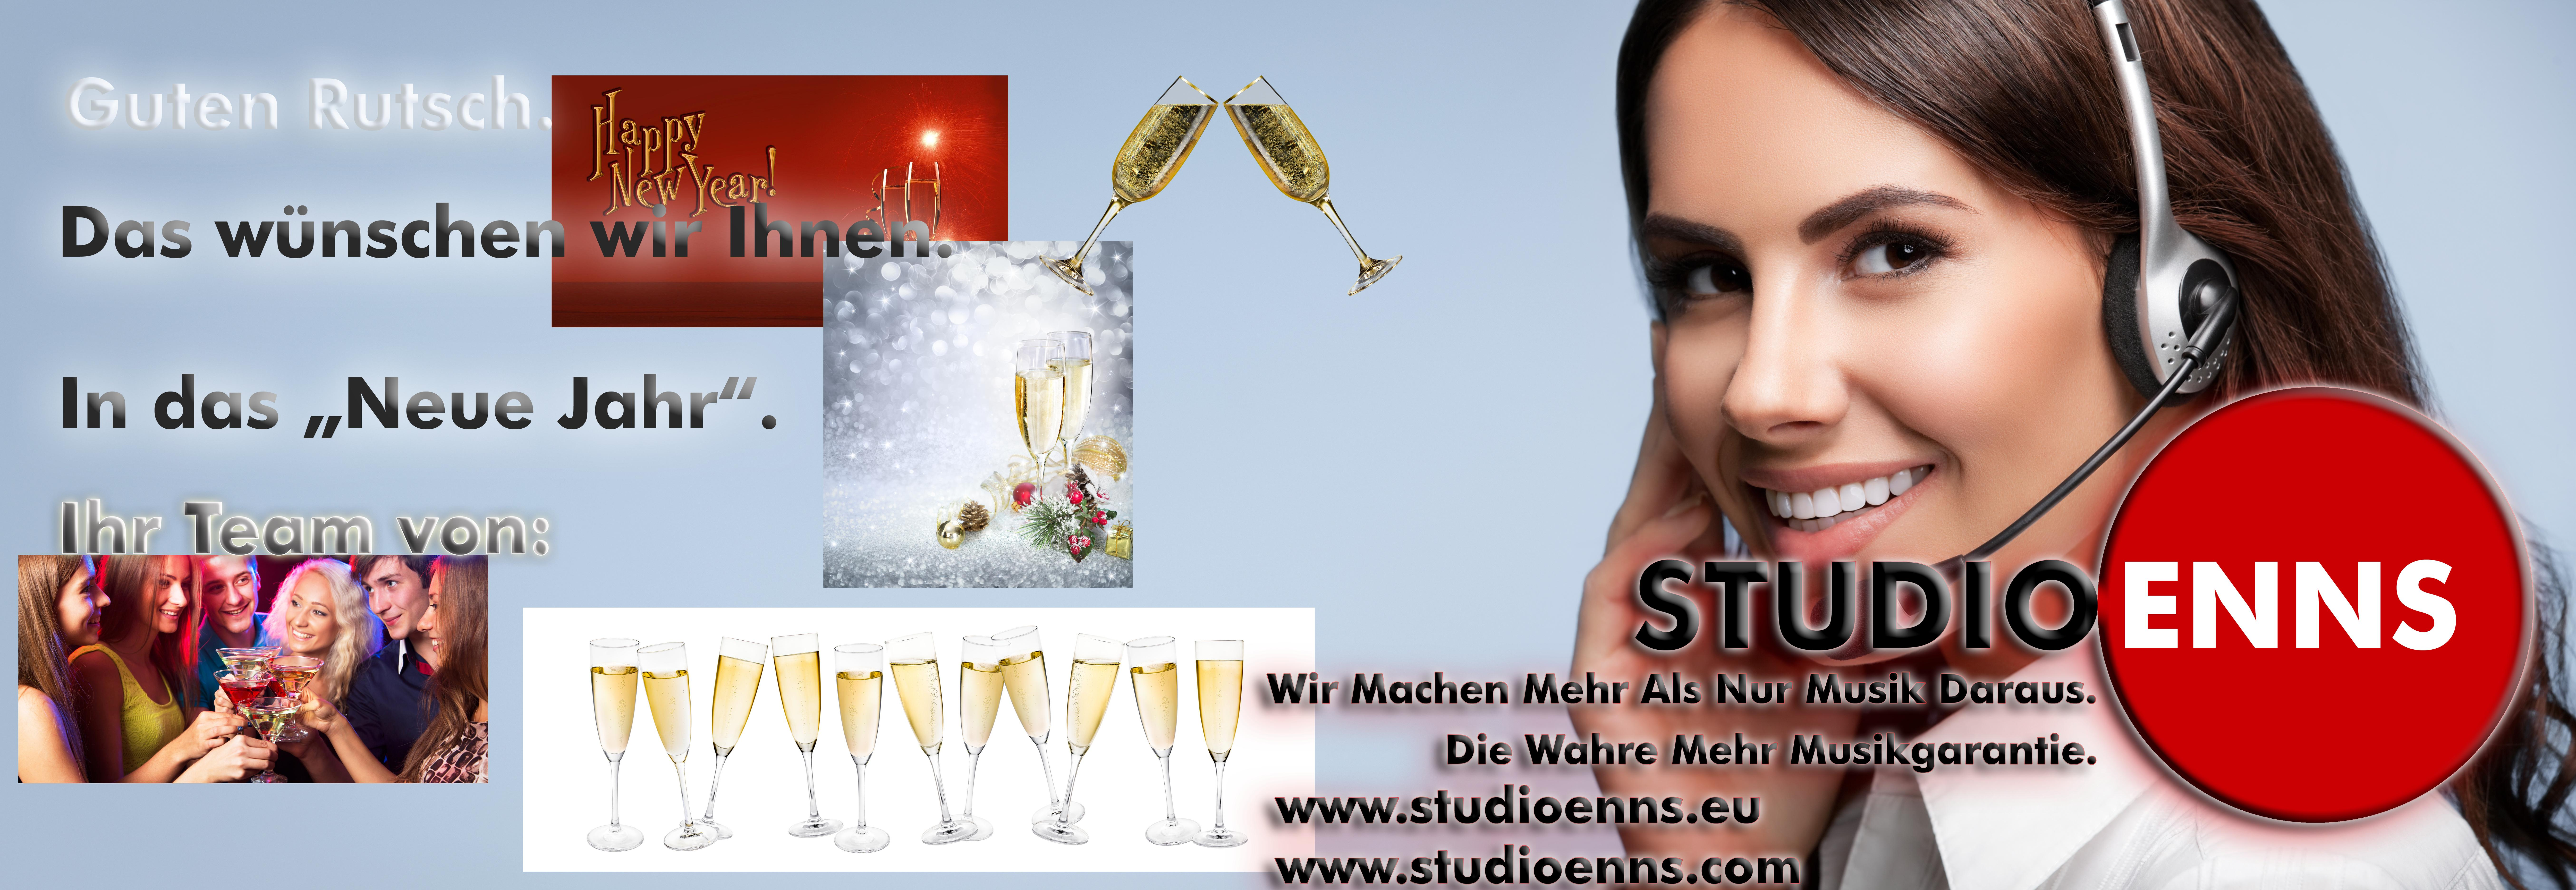 Silvester mit Studio Enns